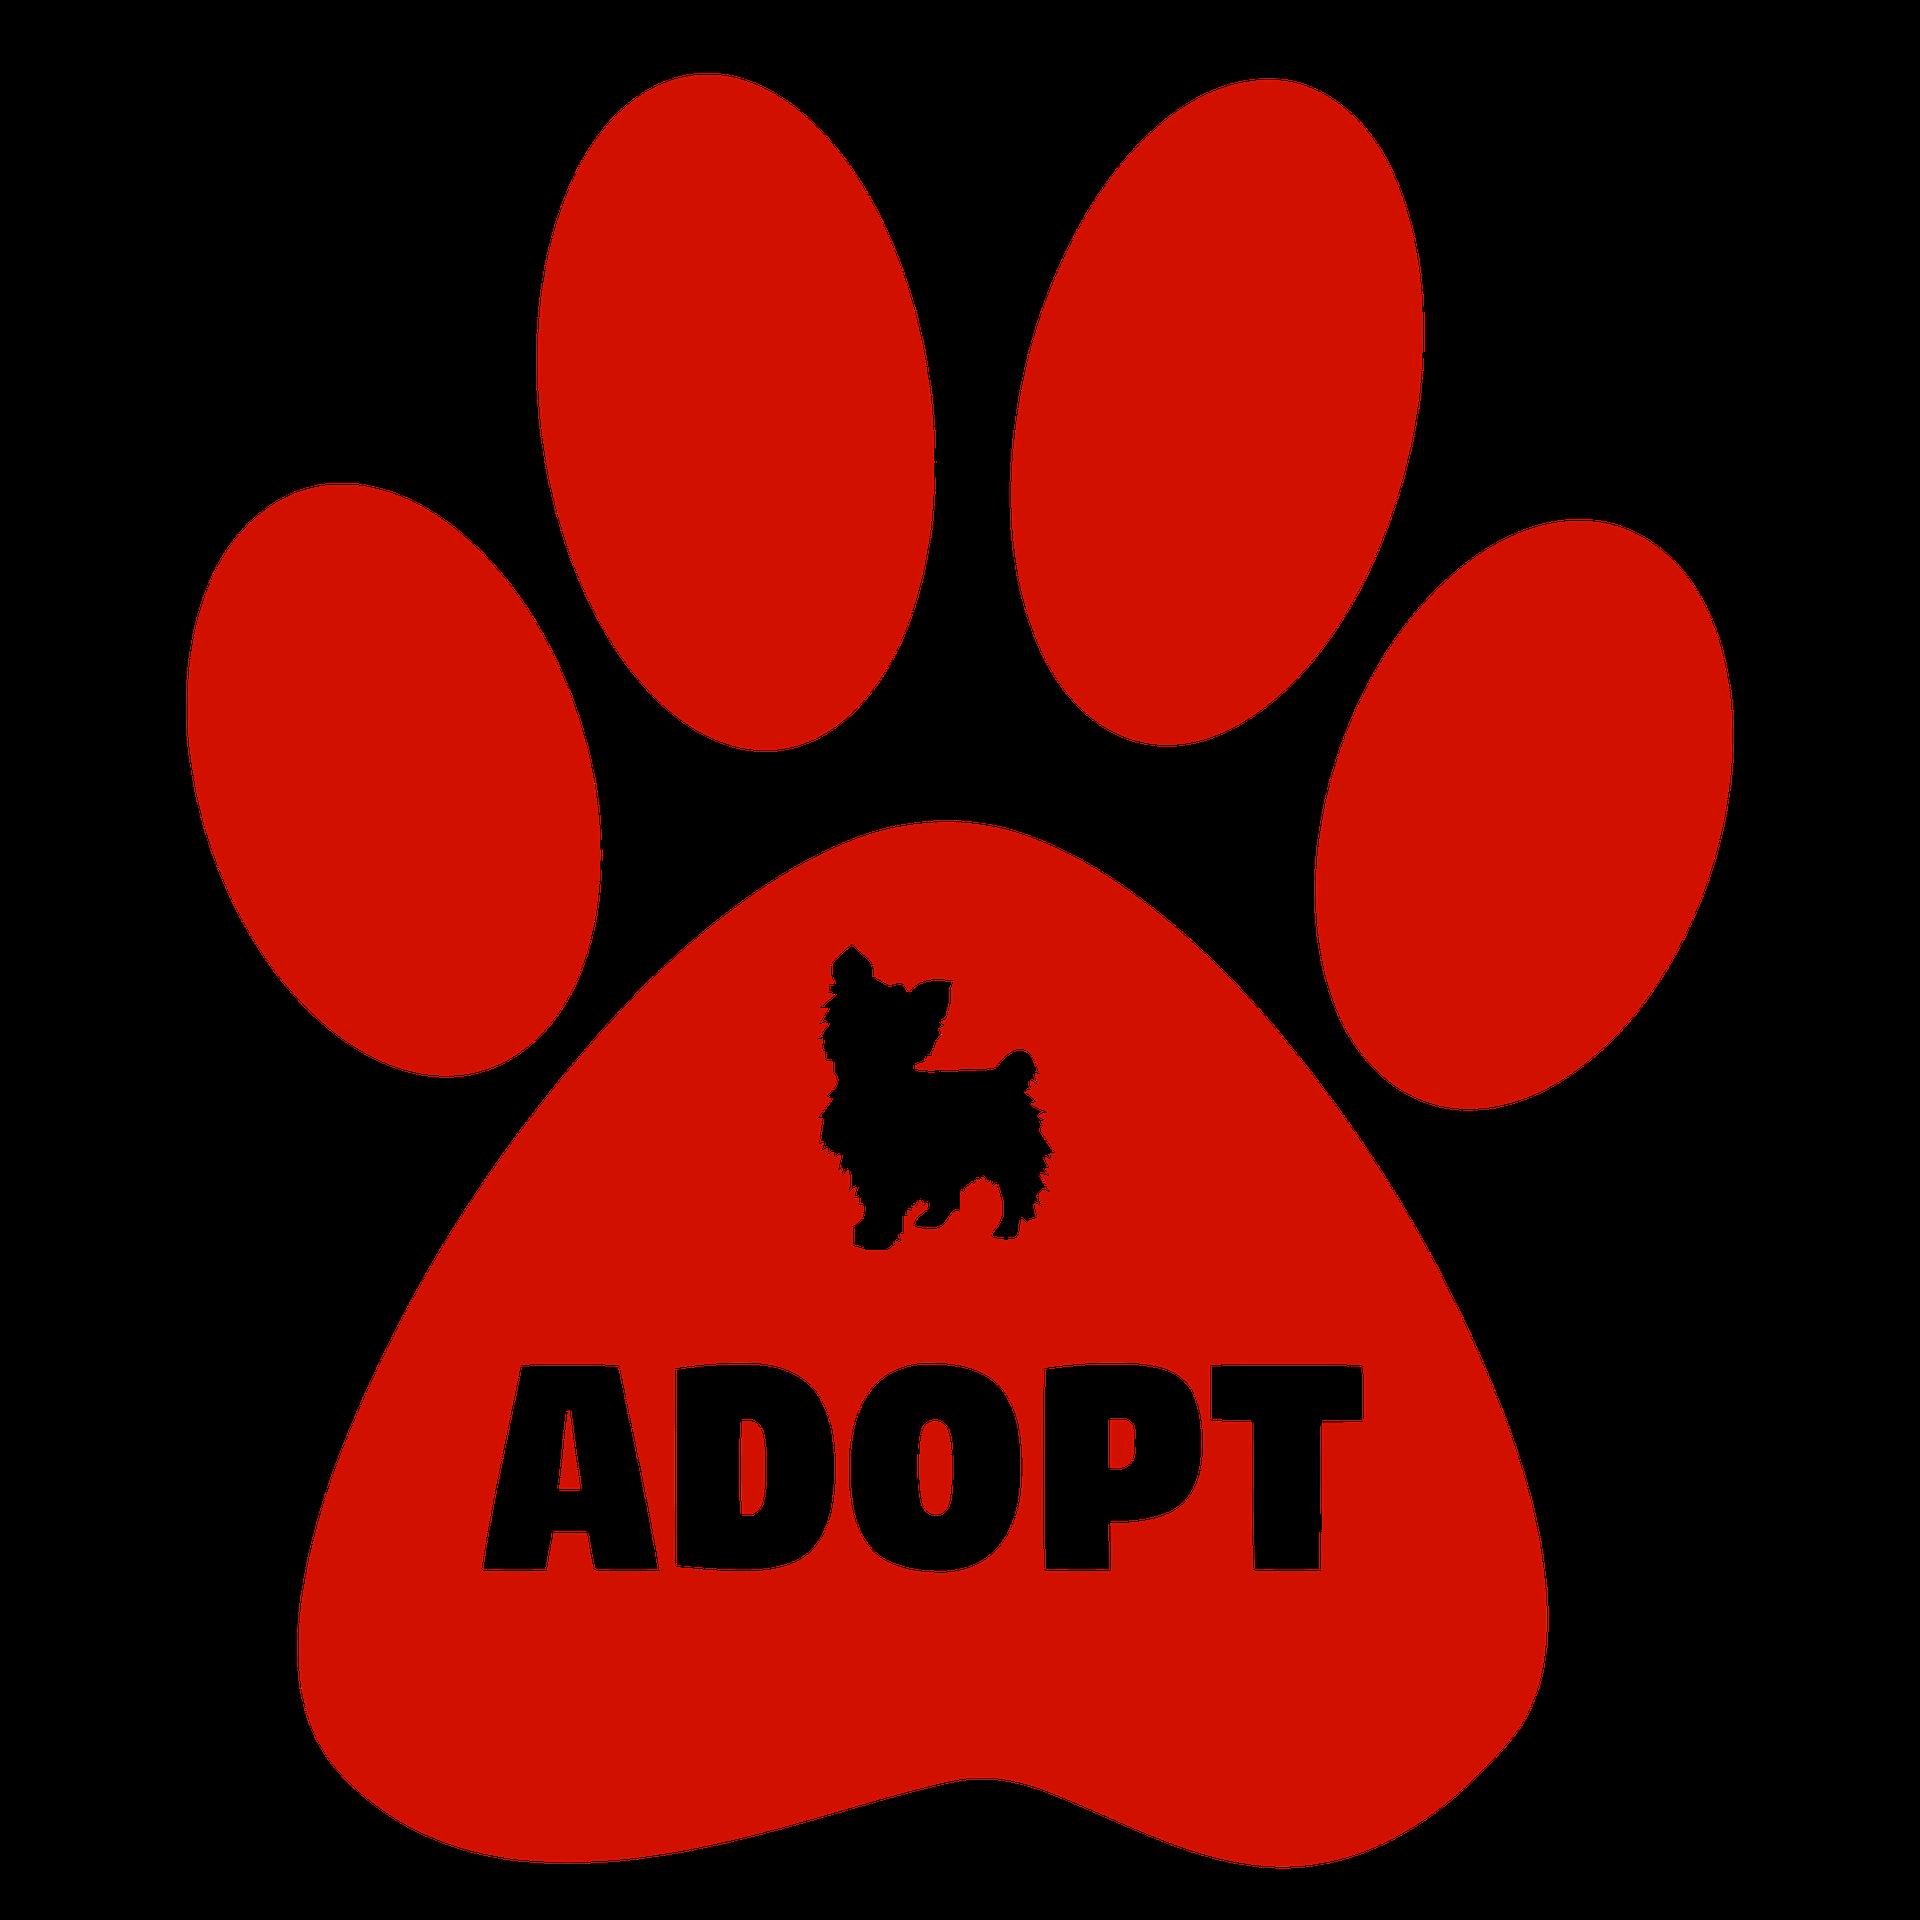 adopt-2167903_1920